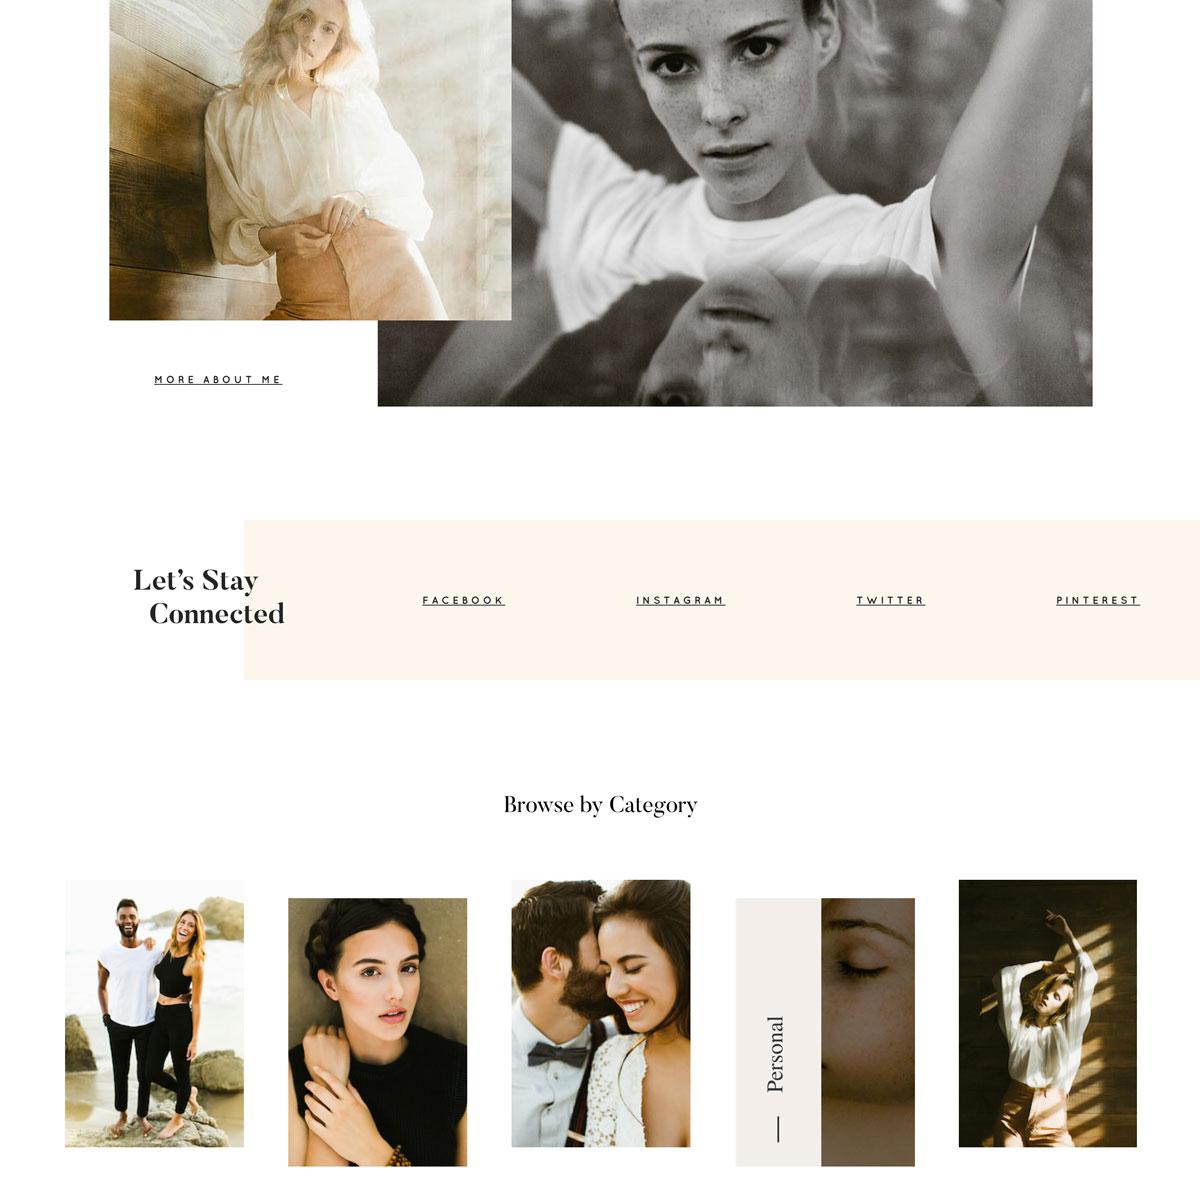 Trento theme design, switch from Squarespace to WordPress, Flothemes, Ben Sasso photography 2